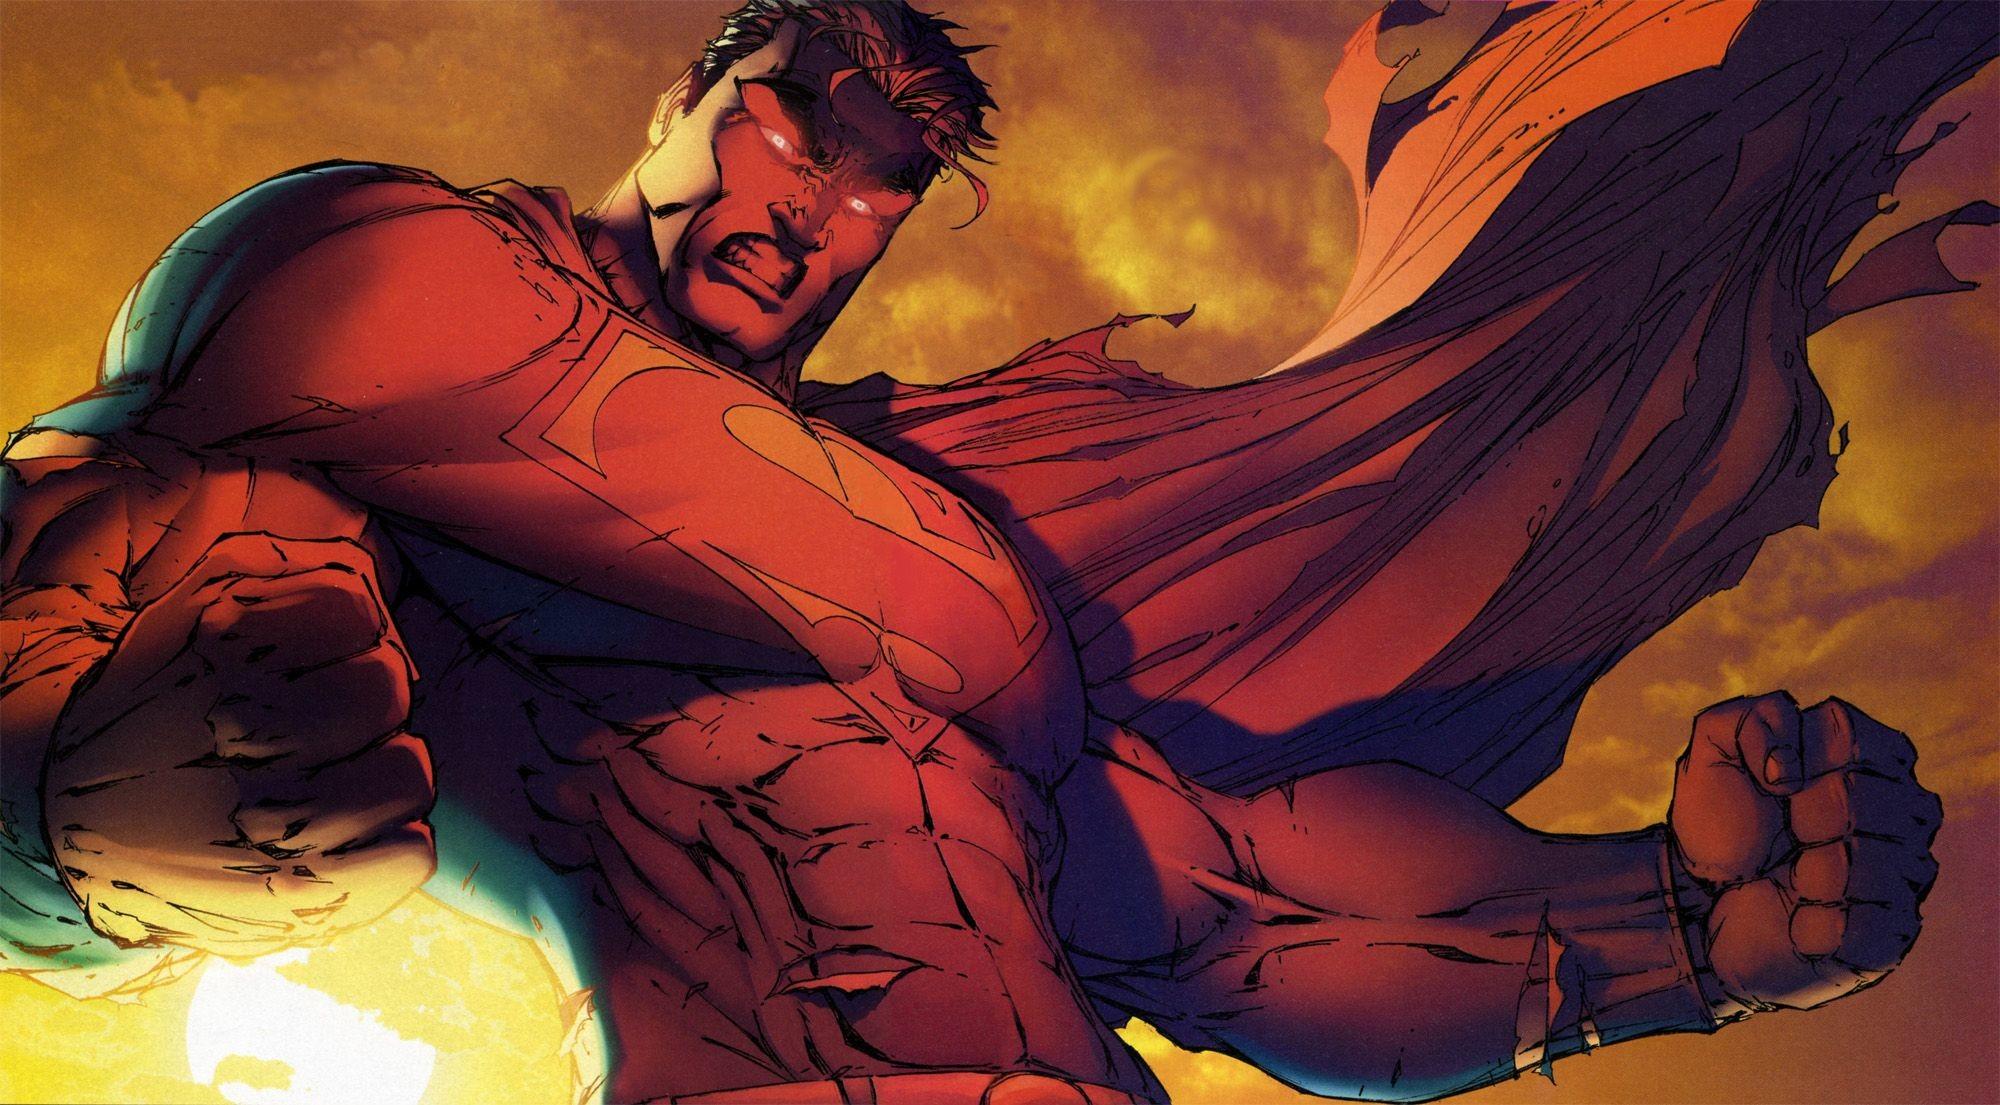 Res: 2000x1105, Best 35 Superman HD Wallpaper for Desktop